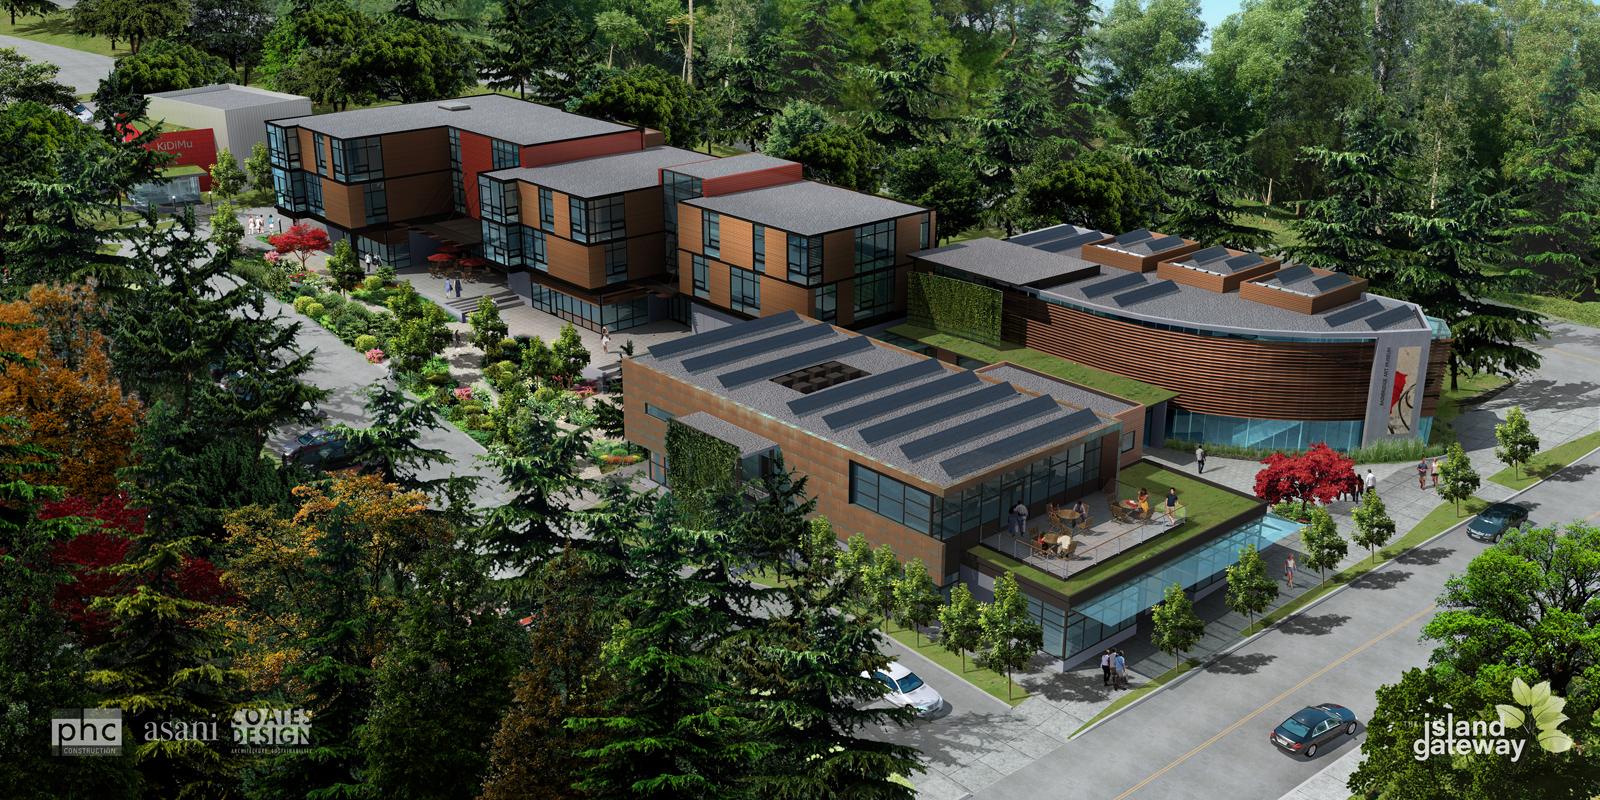 Phc construction bainbridge island s newest development for Bainbridge architects